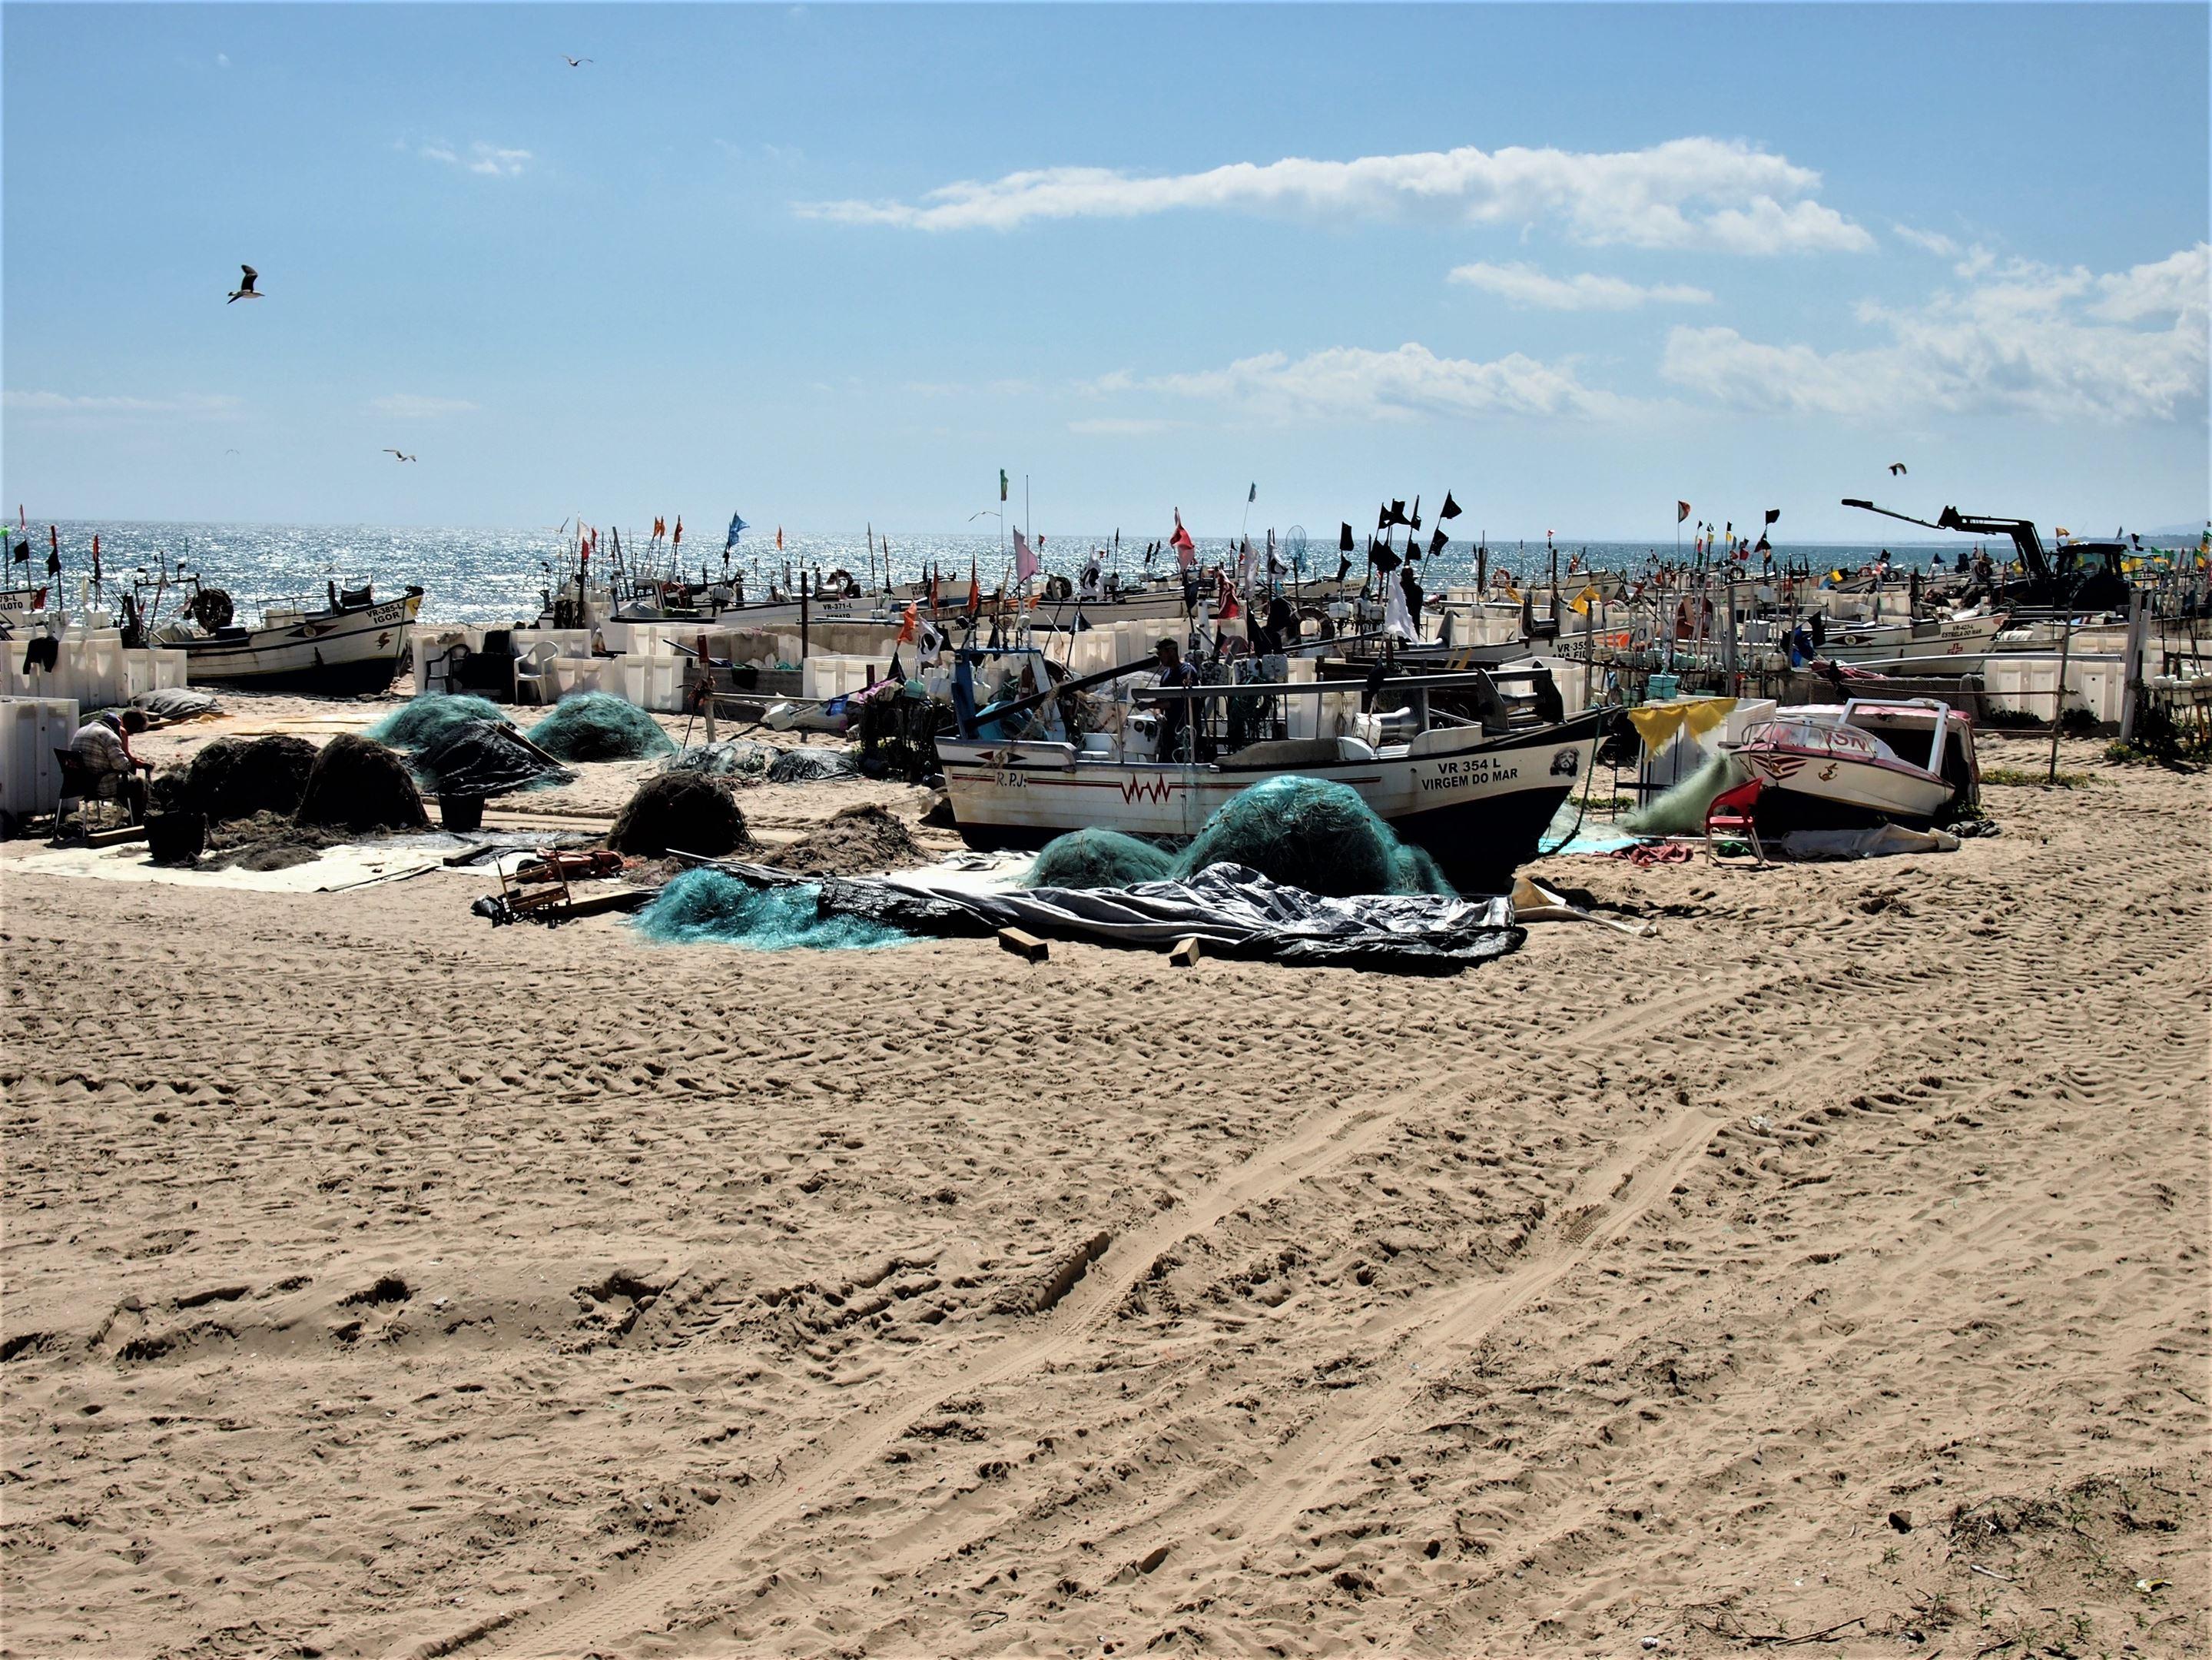 The fishing boats at Praia de Monte Gordo